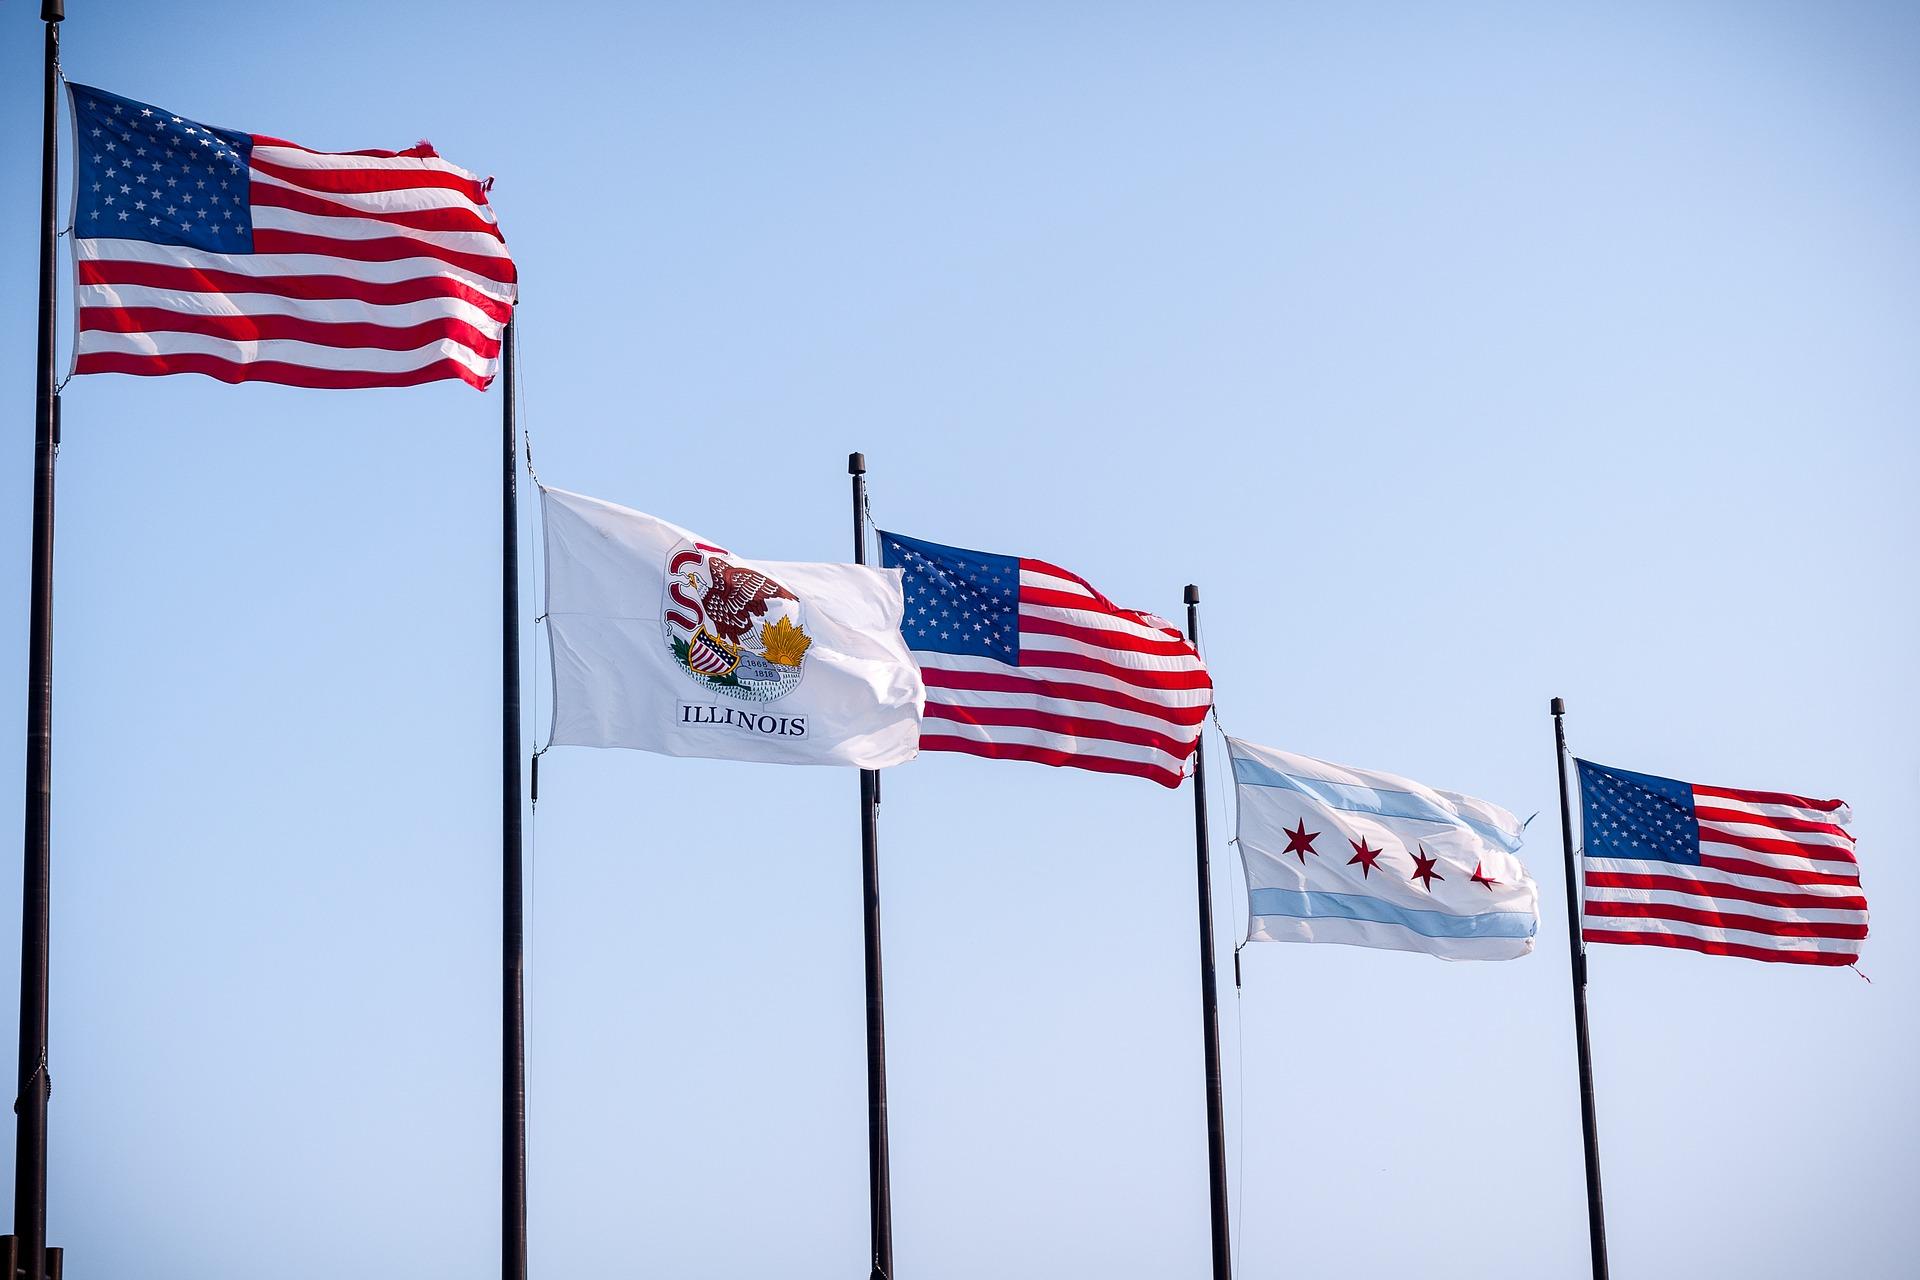 united-states-flag-2740118_1920.jpg